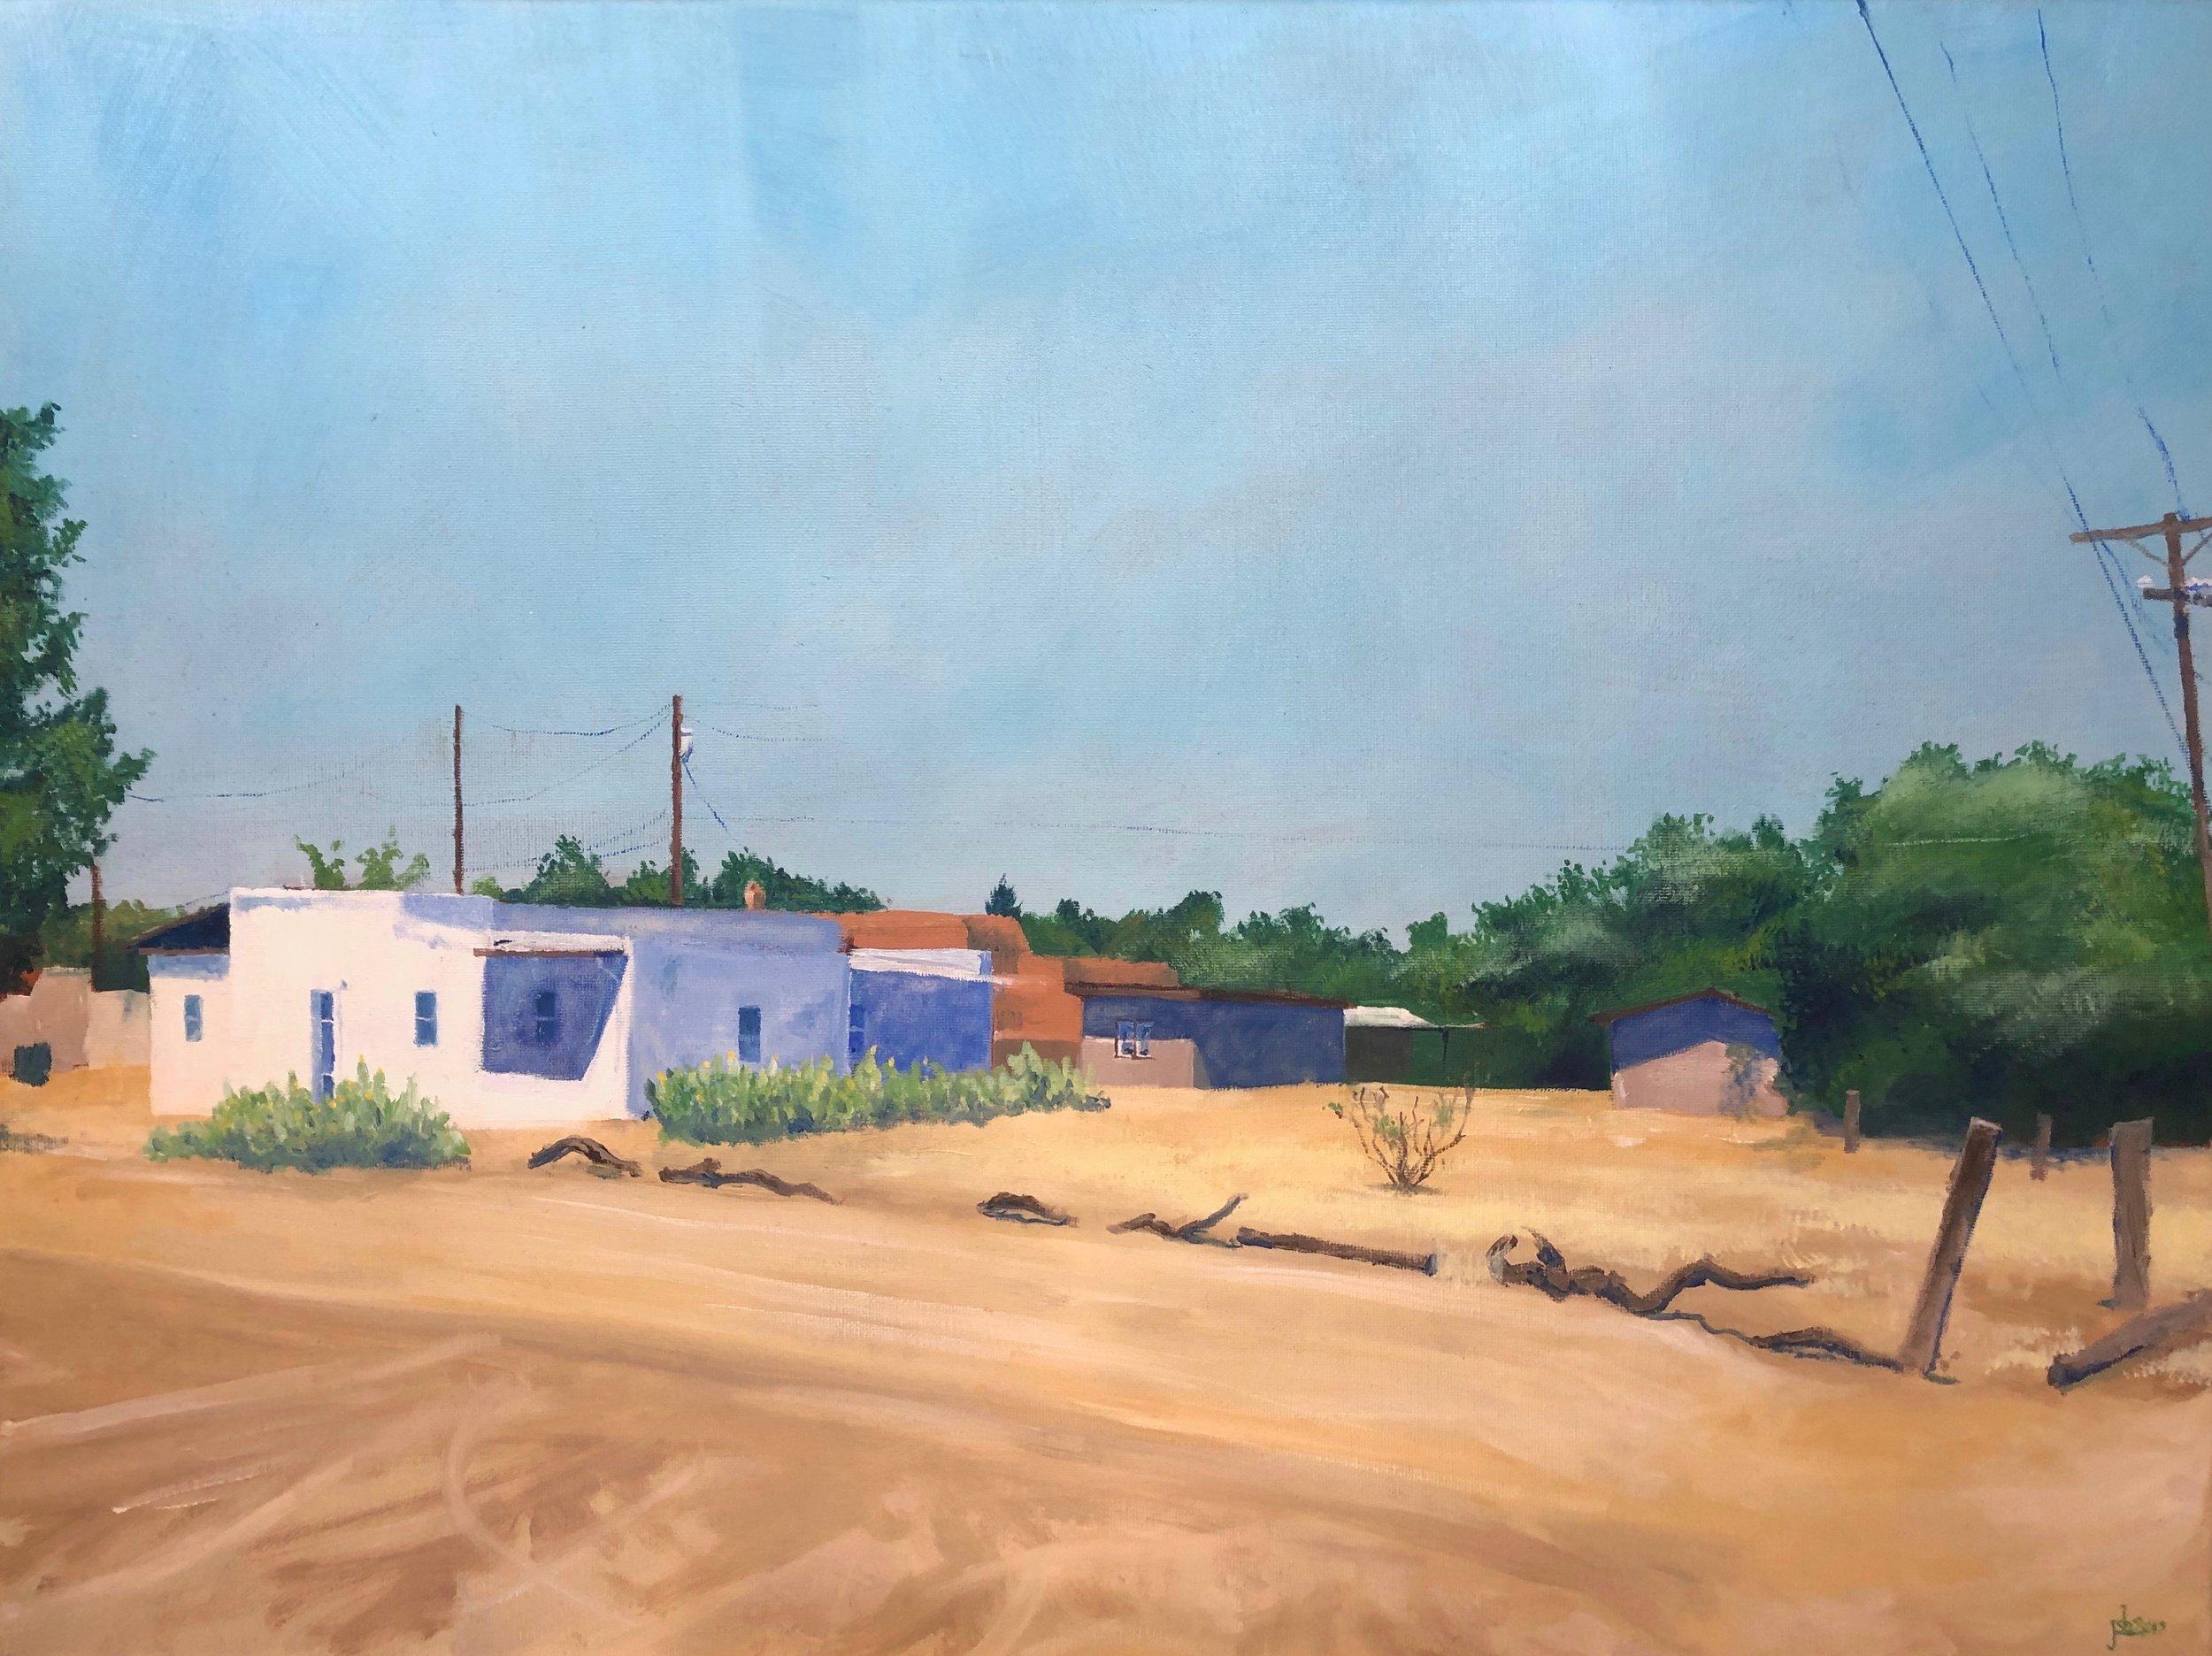 "View from Callejon Picacho, Mesilla, New Mexico; Oil on Canvas; 18x24""; 2019"